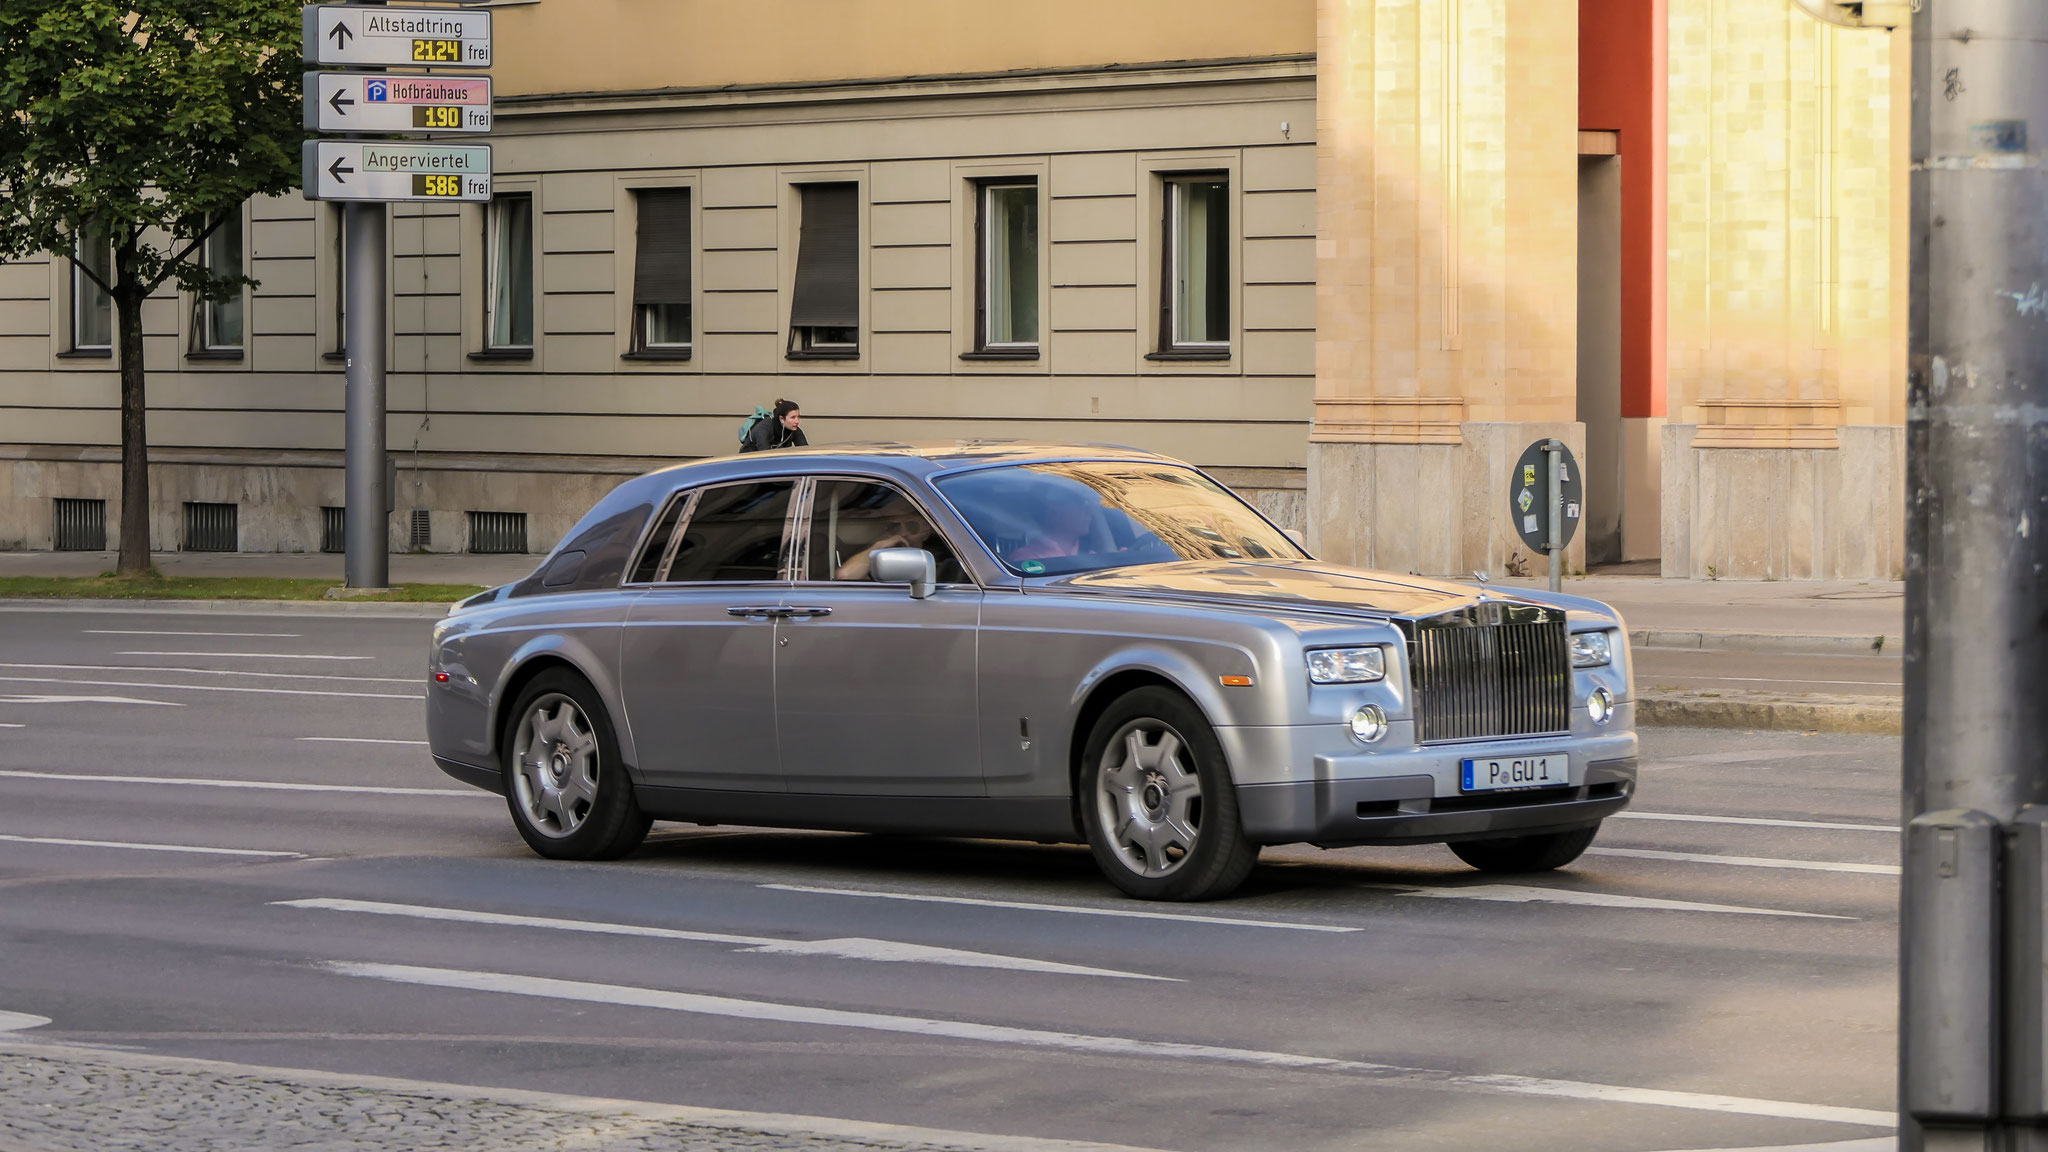 Rolls Royce Phantom - P-GU-1